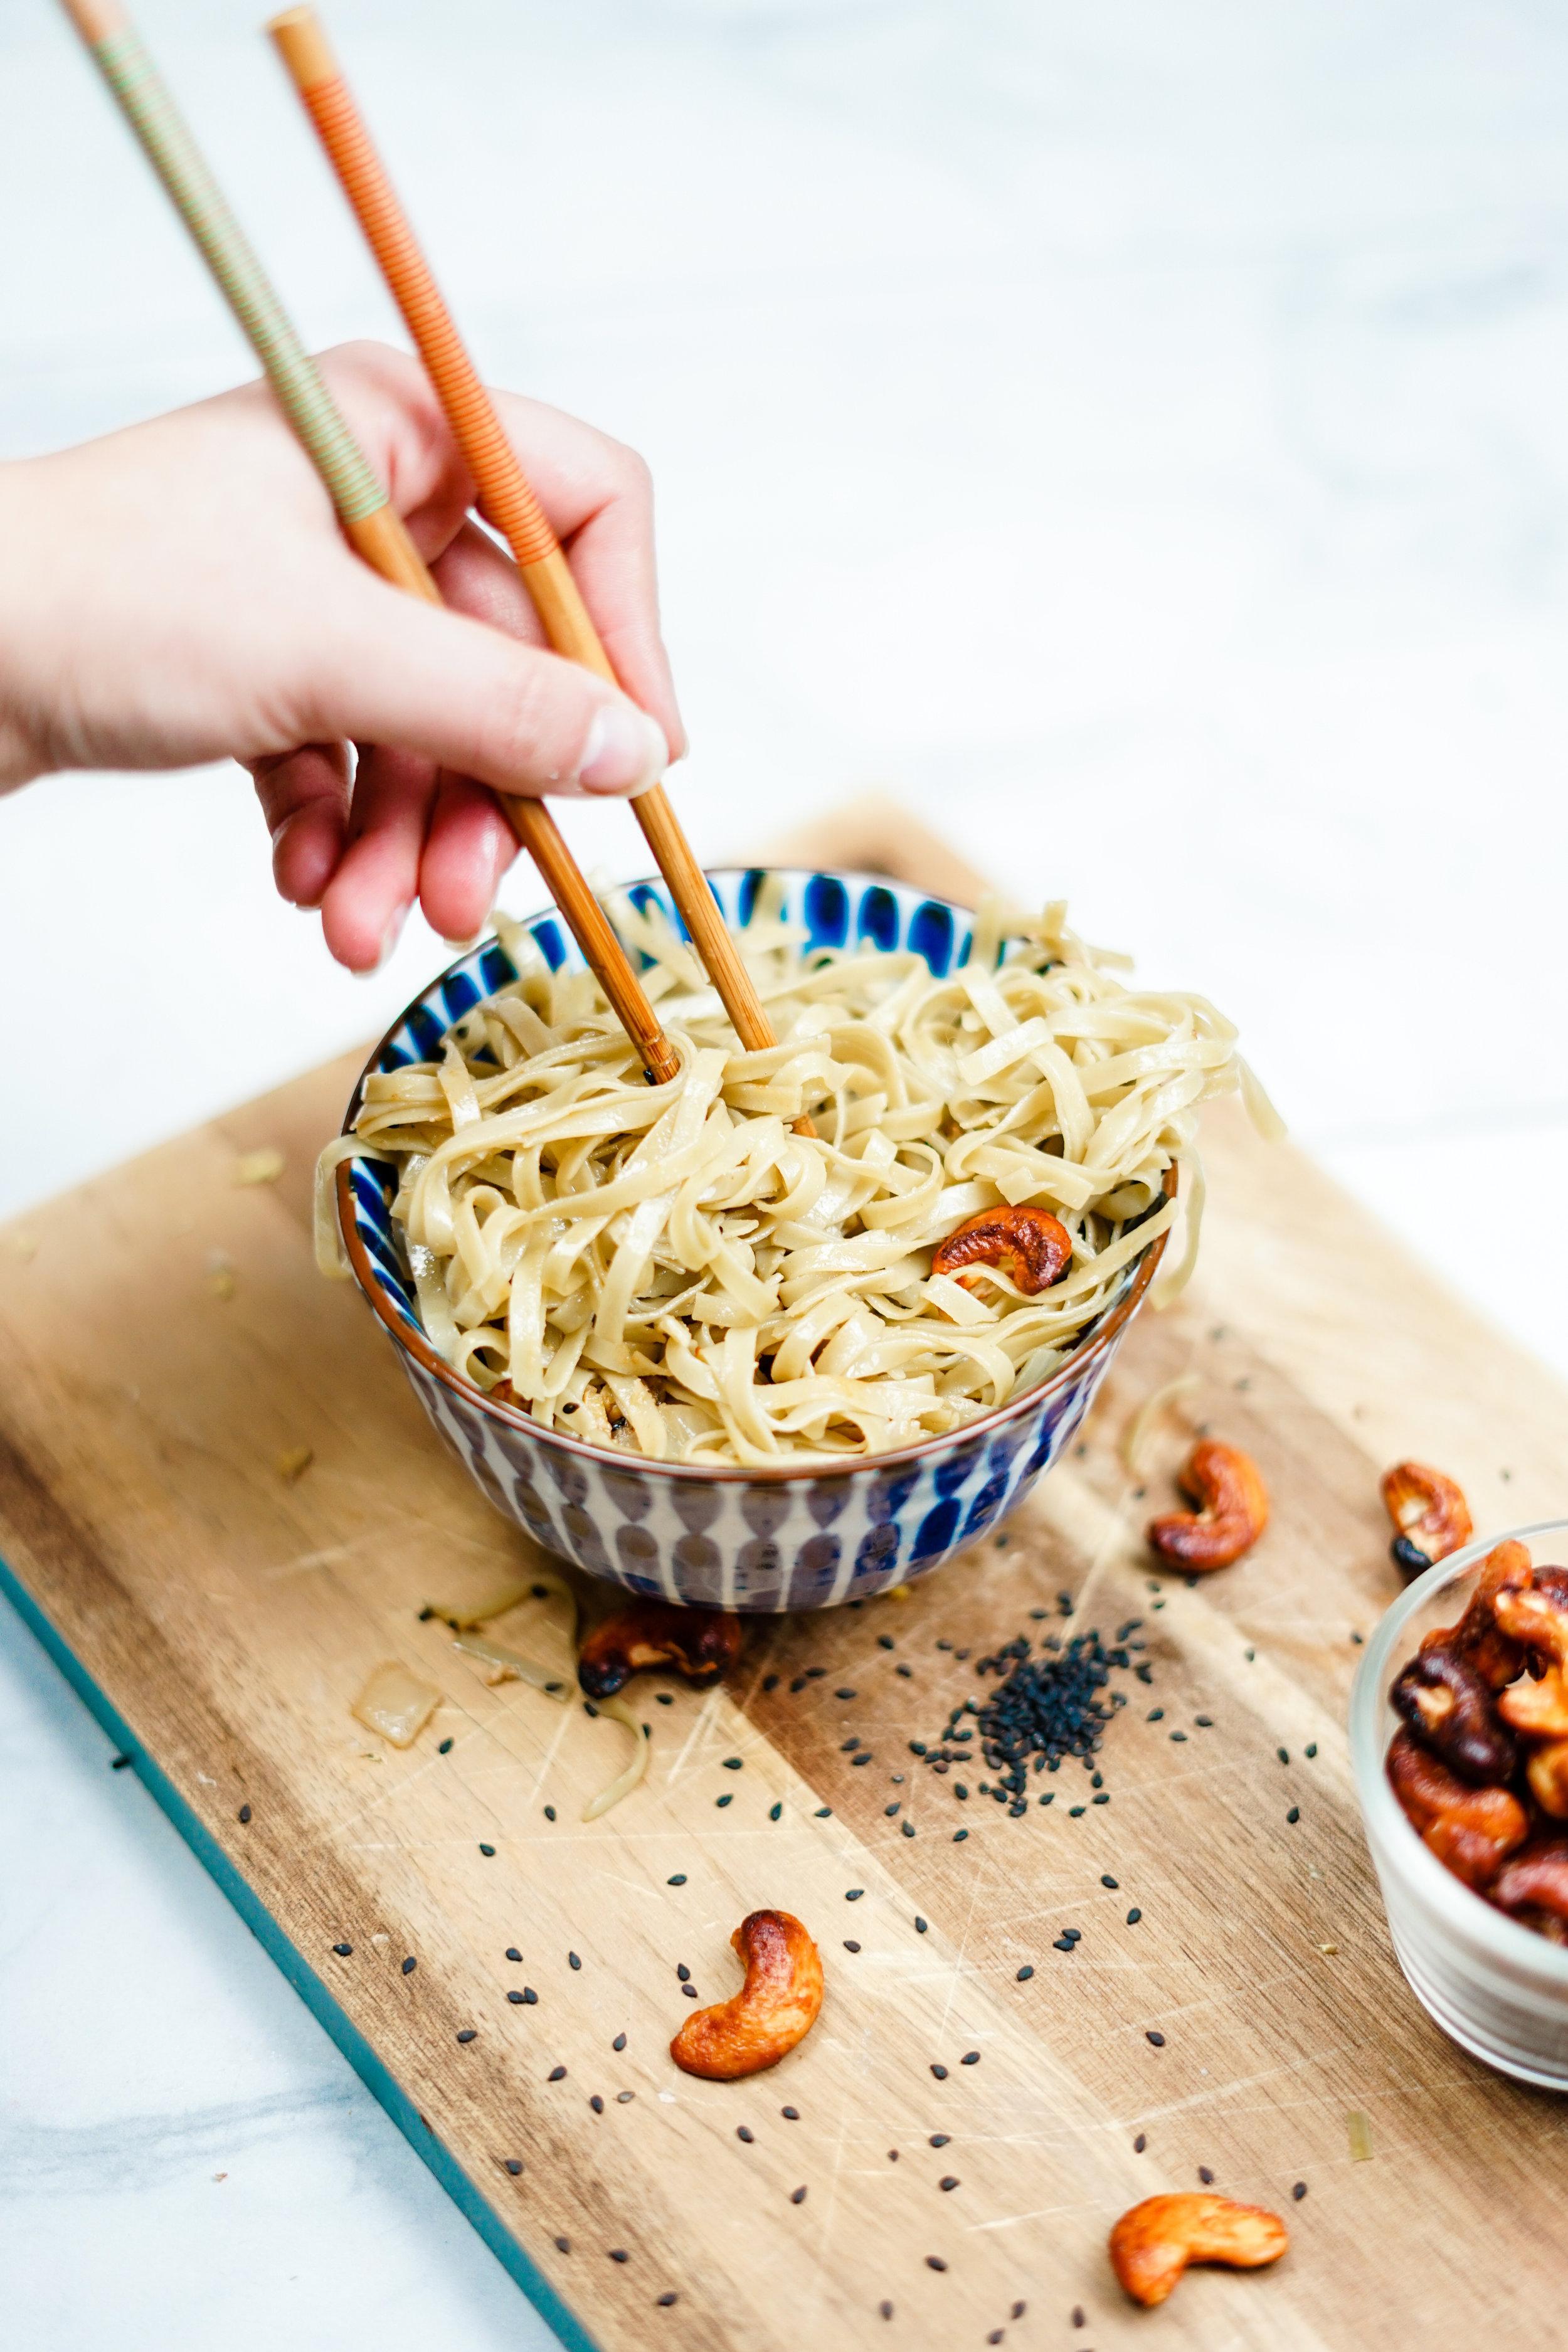 i am rorie, i am rorie vegan food, chicago vegan food blogger, green tea noodles, cooking with tea, tea infused foods, green tea garlic ginger noodles, easy garlic noodle recipe, garlic and ginger flavors, easy noodle recipe, easy vegan noodle recipe, sesame oil, the best garlic noodles ever, how to make garlic noodles, green tea infused rice noodles, how to make garlic noodles, easy vegan comfort food, the best vegan comfort food, i am rorie comfort food, sriracha roasted cashews, sesame seeds, whole foods, i am rorie food